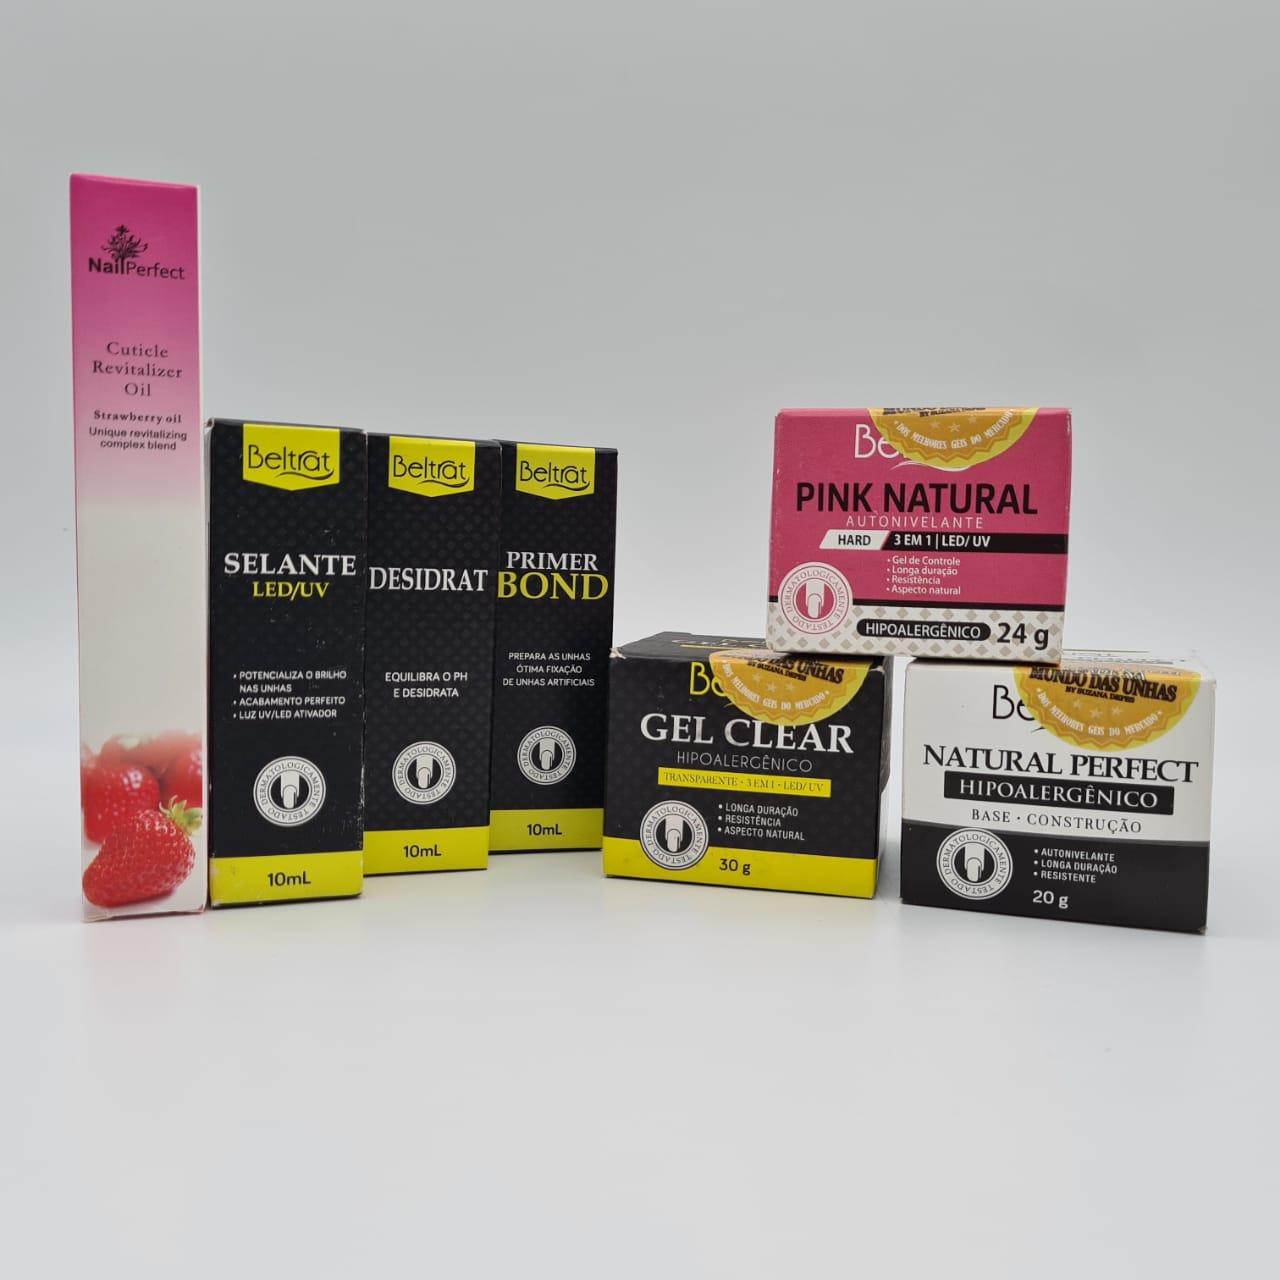 Kit Unhas em Gel Beltrat + Caneta Hidratante